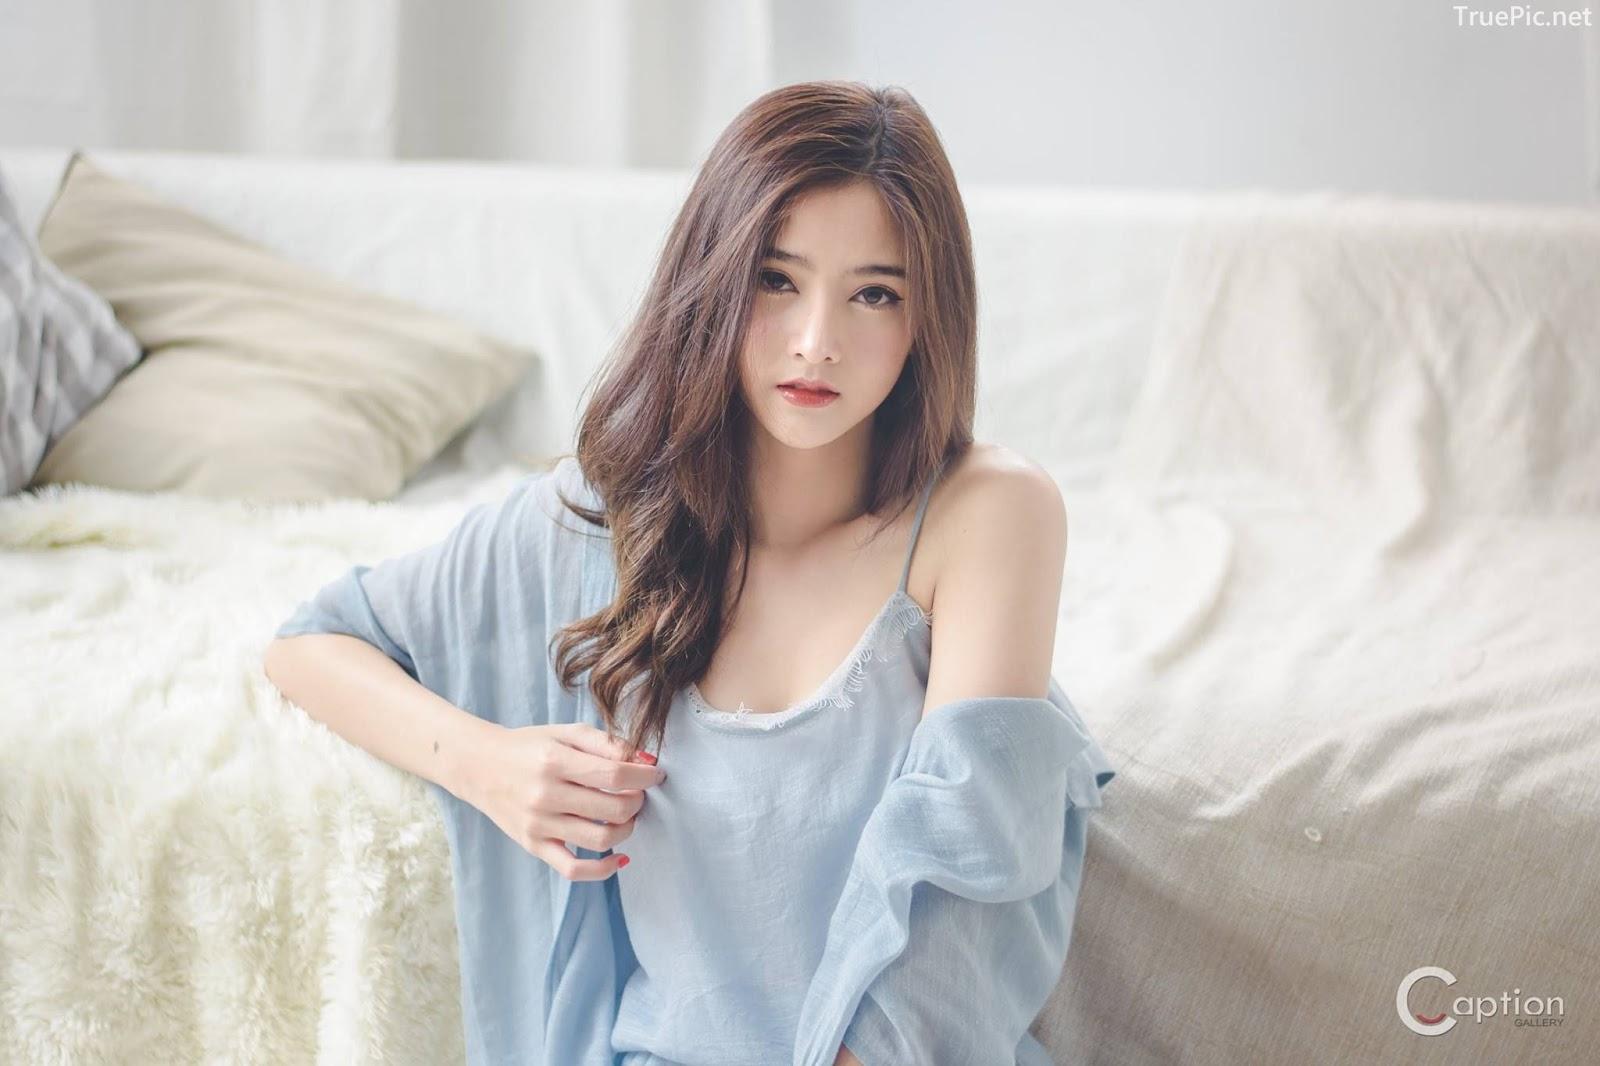 Thailand pretty girl Aintoaon Nantawong - Photo album Beautiful Morning Monday - Picture 9